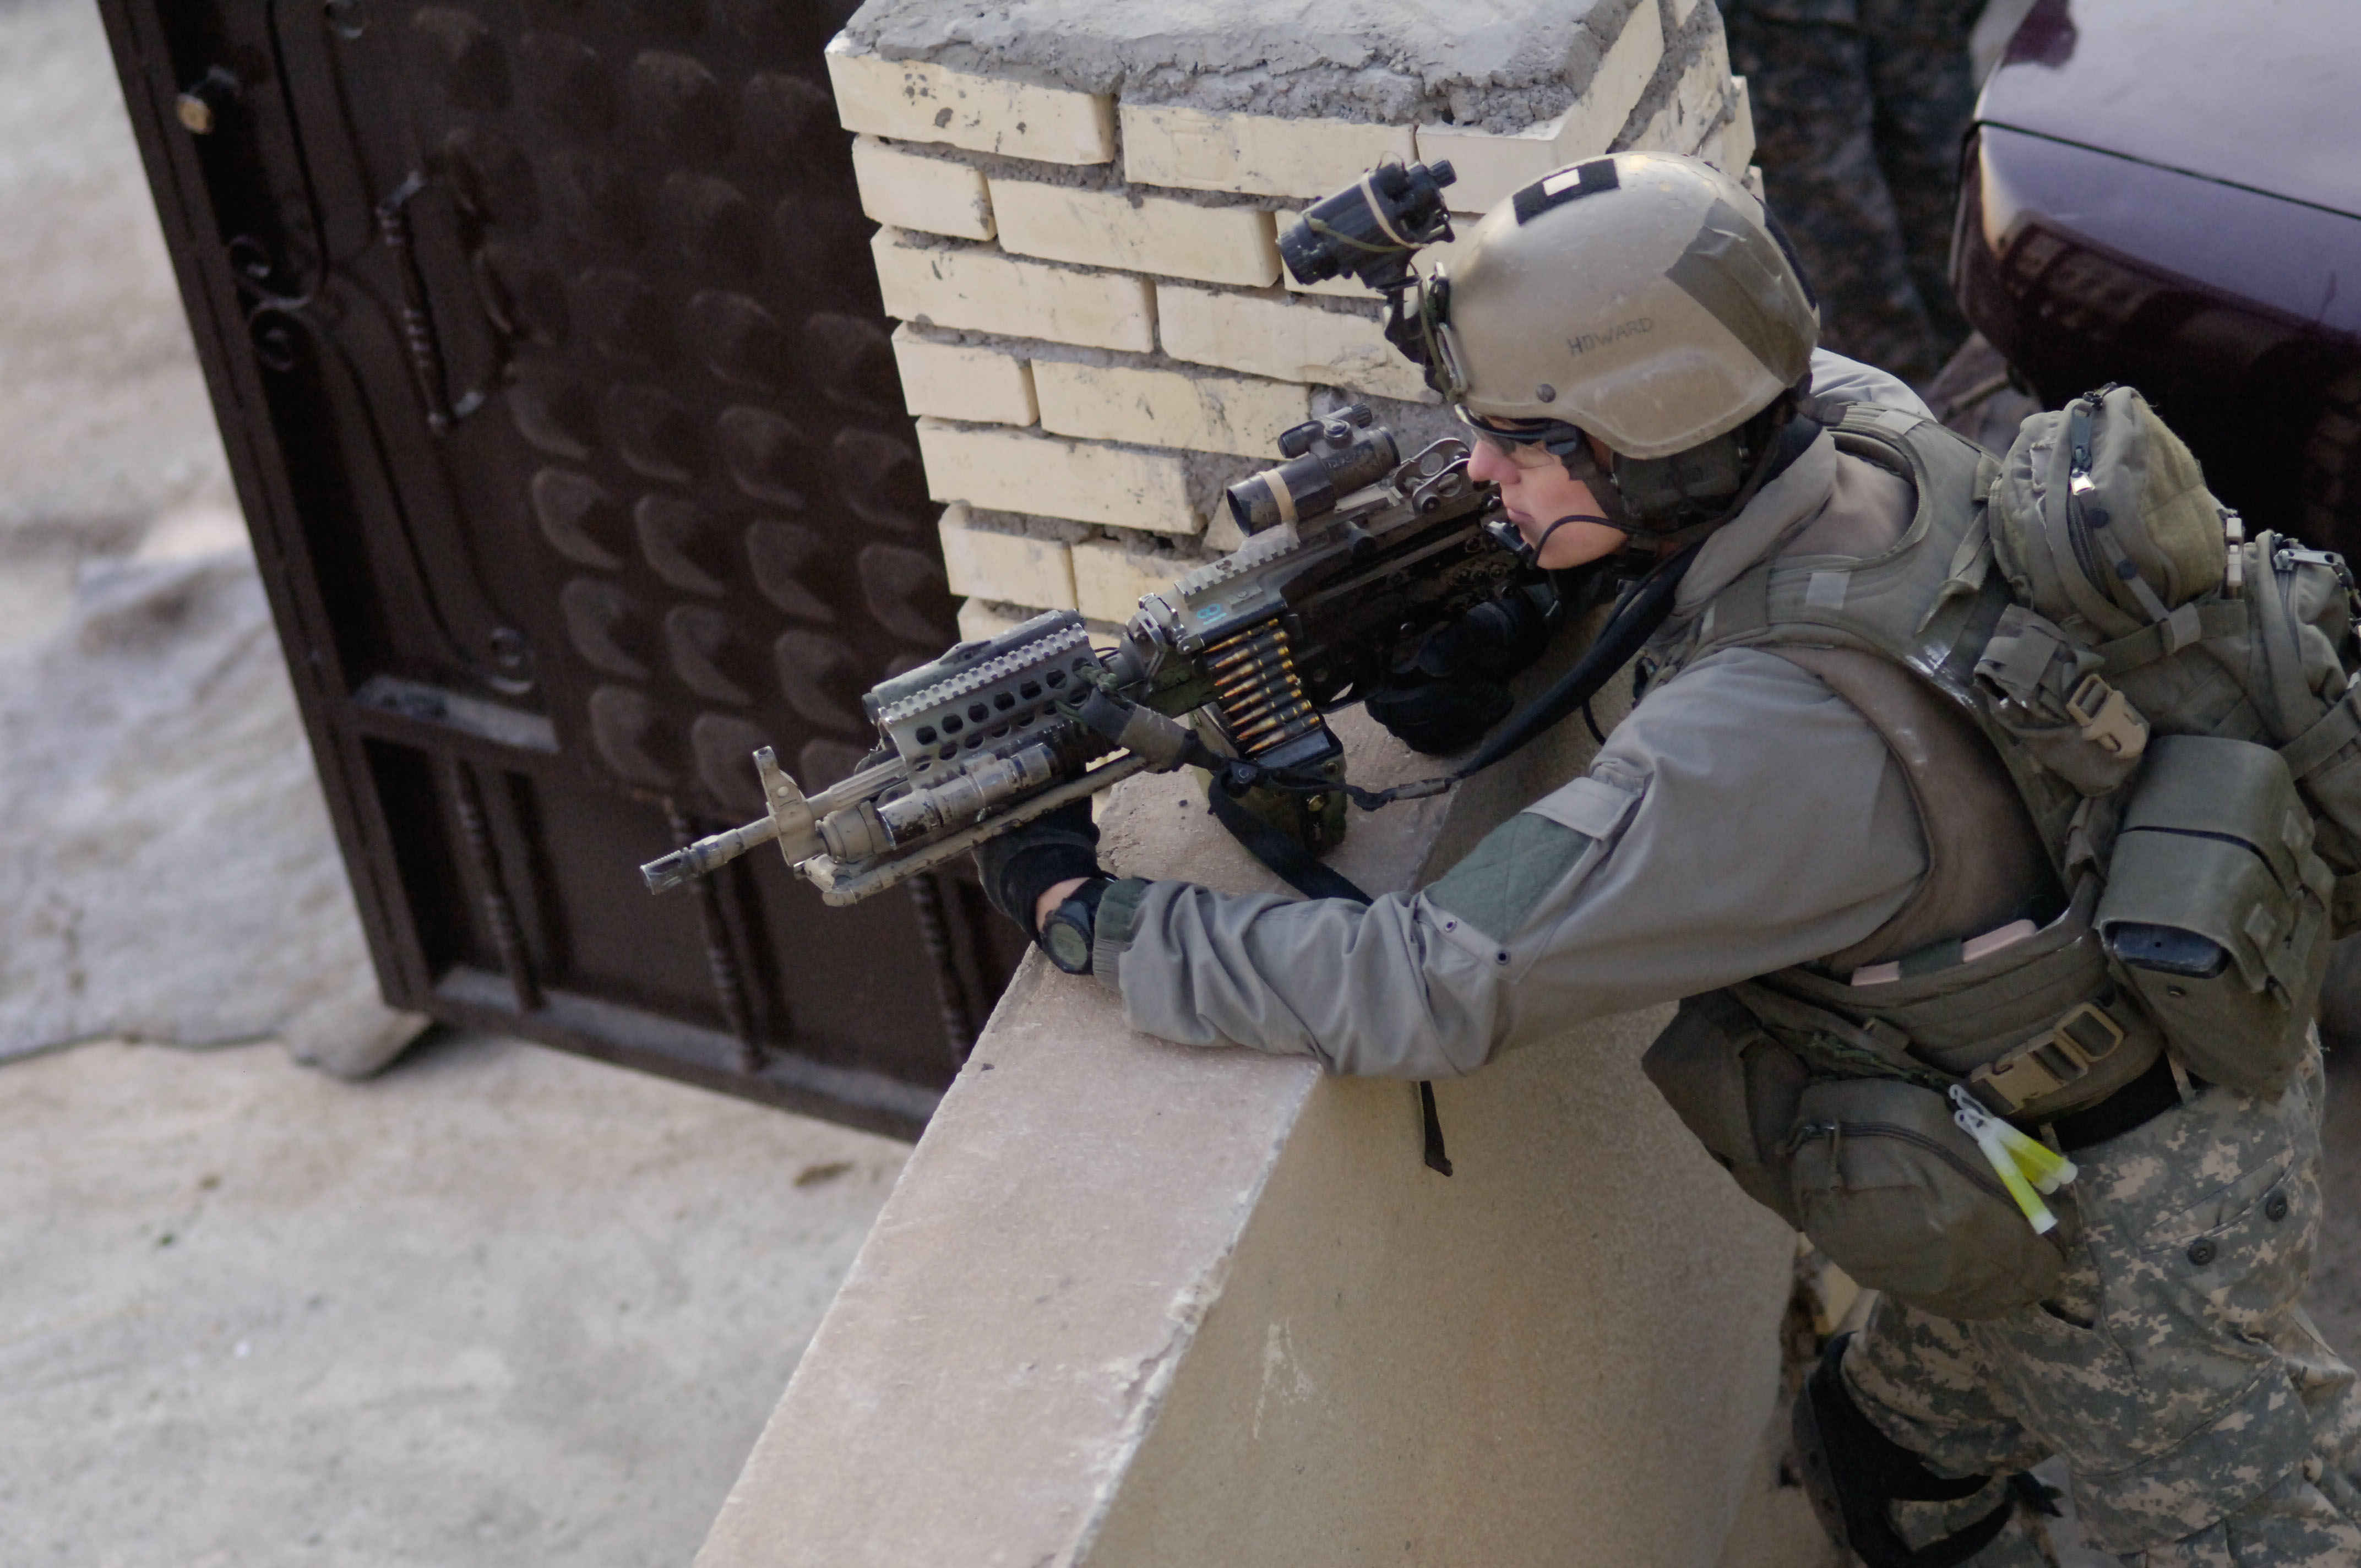 U.S._Army_Ranger,_2nd_Battalion,_75th_Ranger_Regiment_providing_Overwatch_in_Iraq_2009